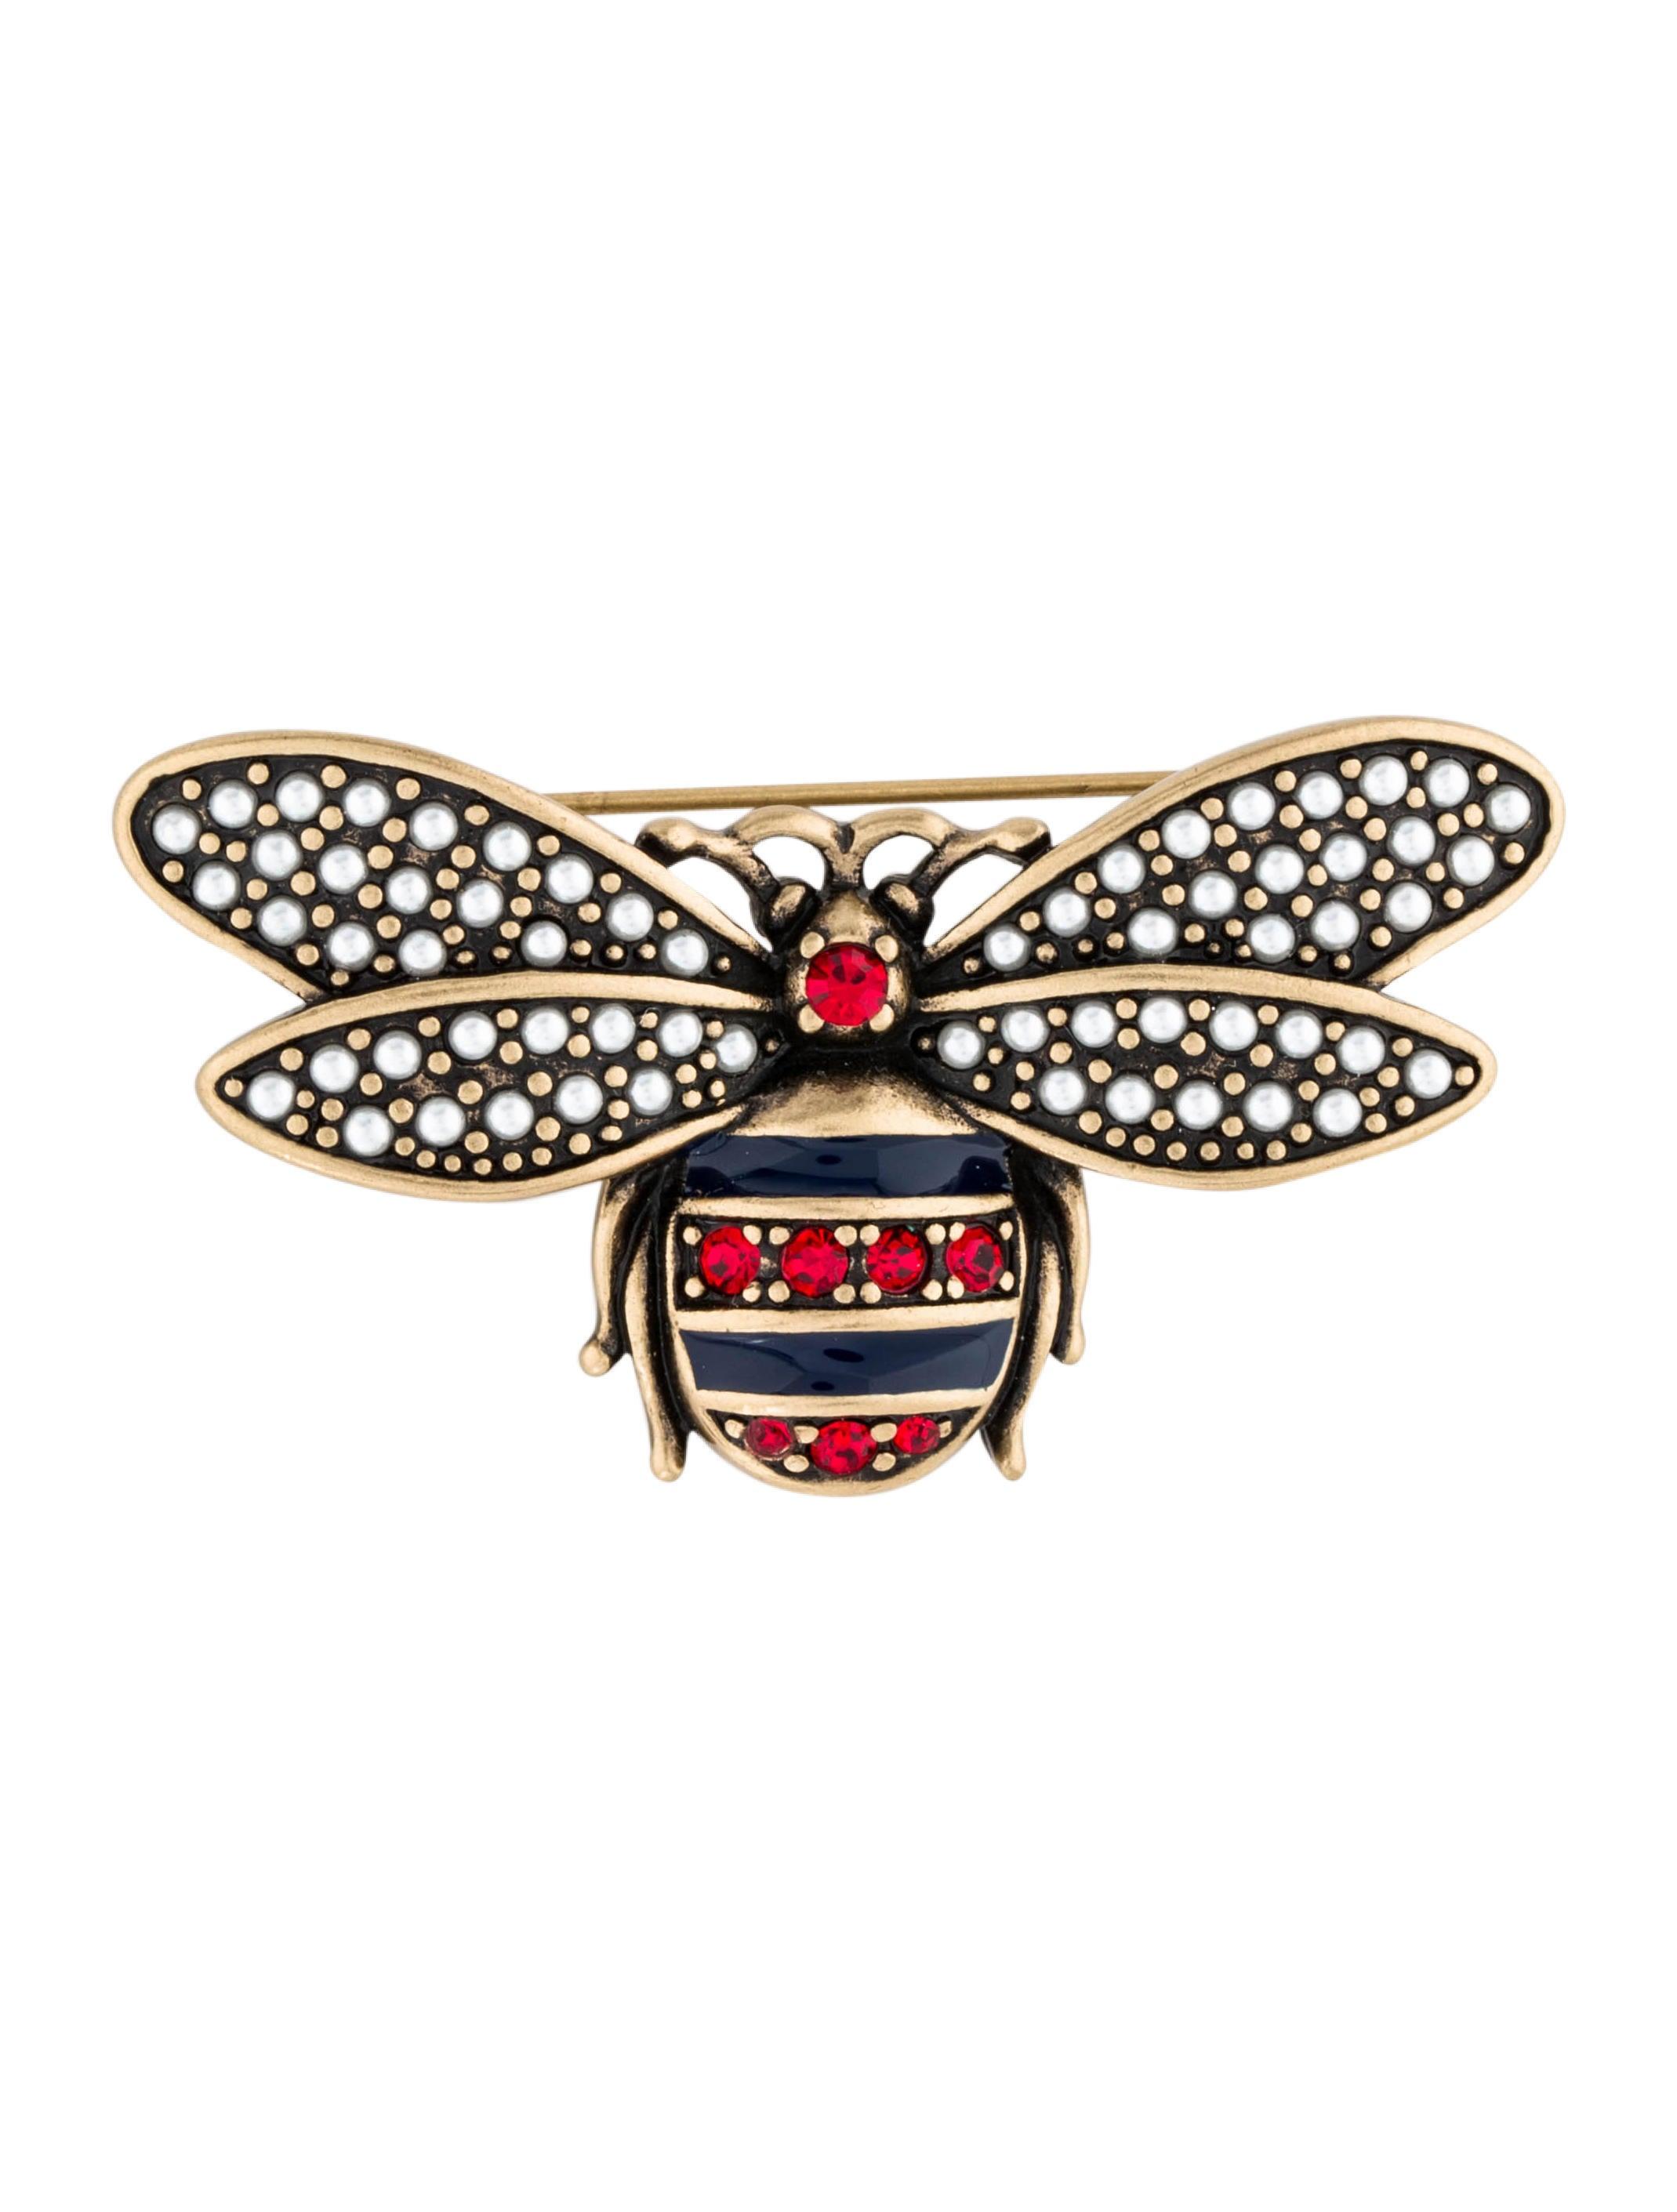 bb14c354790 Gucci Bee Brooch - Brooches - GUC230045